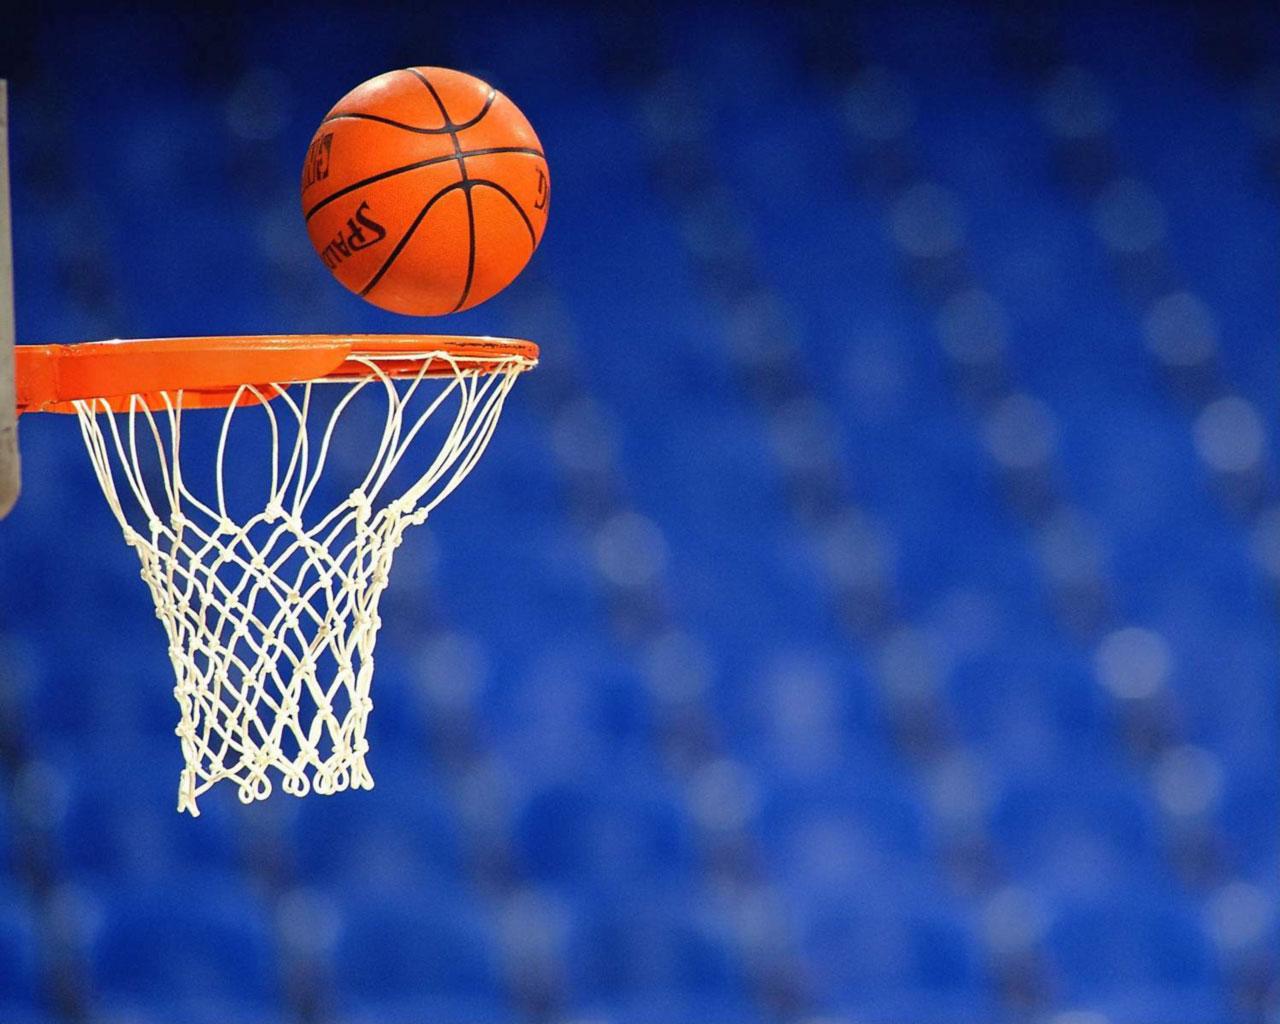 HD Wallpaper | Background ID:125890. 1280x1024 Sports Basketball